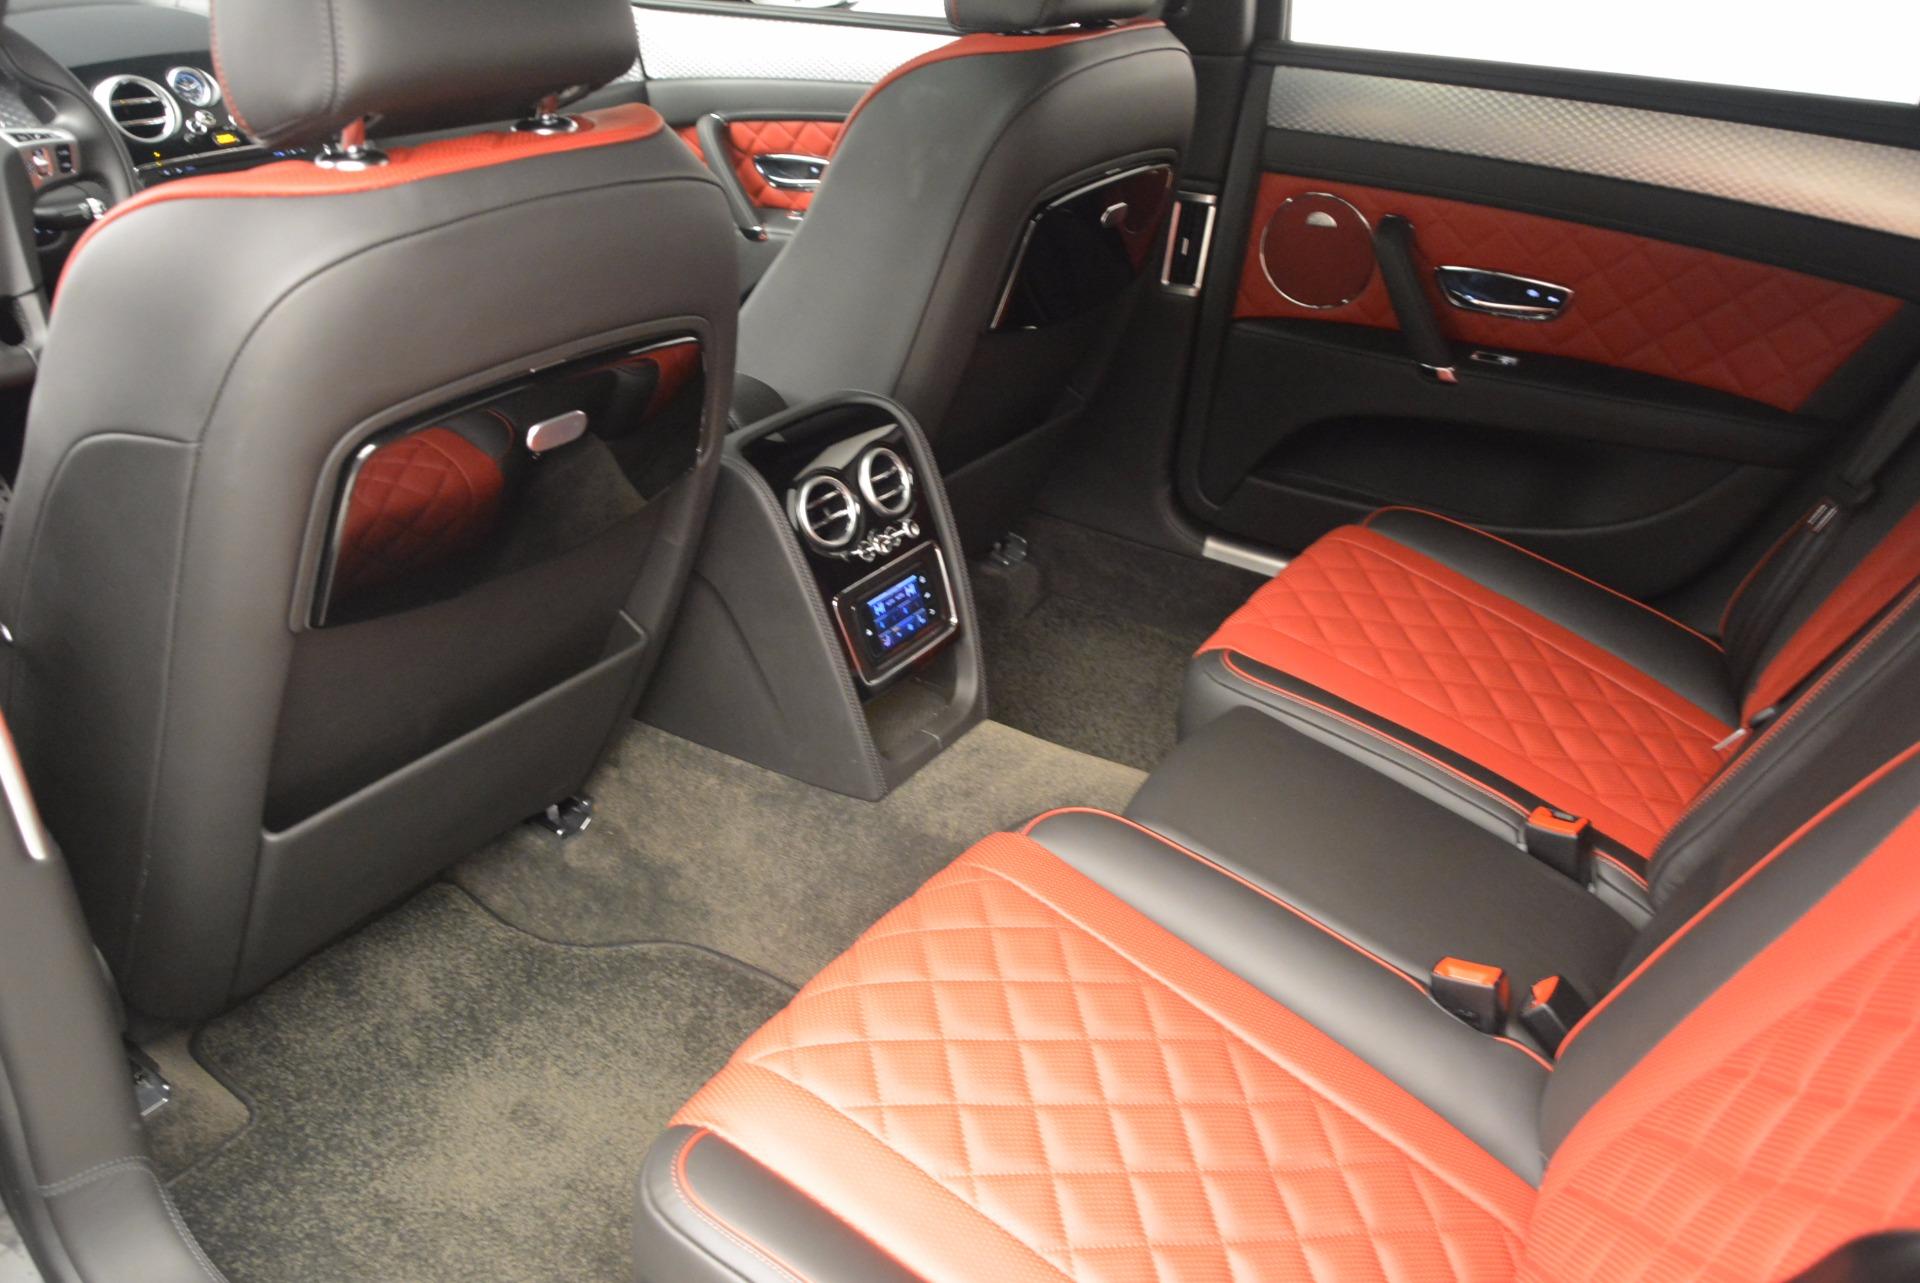 Used 2017 Bentley Flying Spur V8 S For Sale In Westport, CT 875_p35